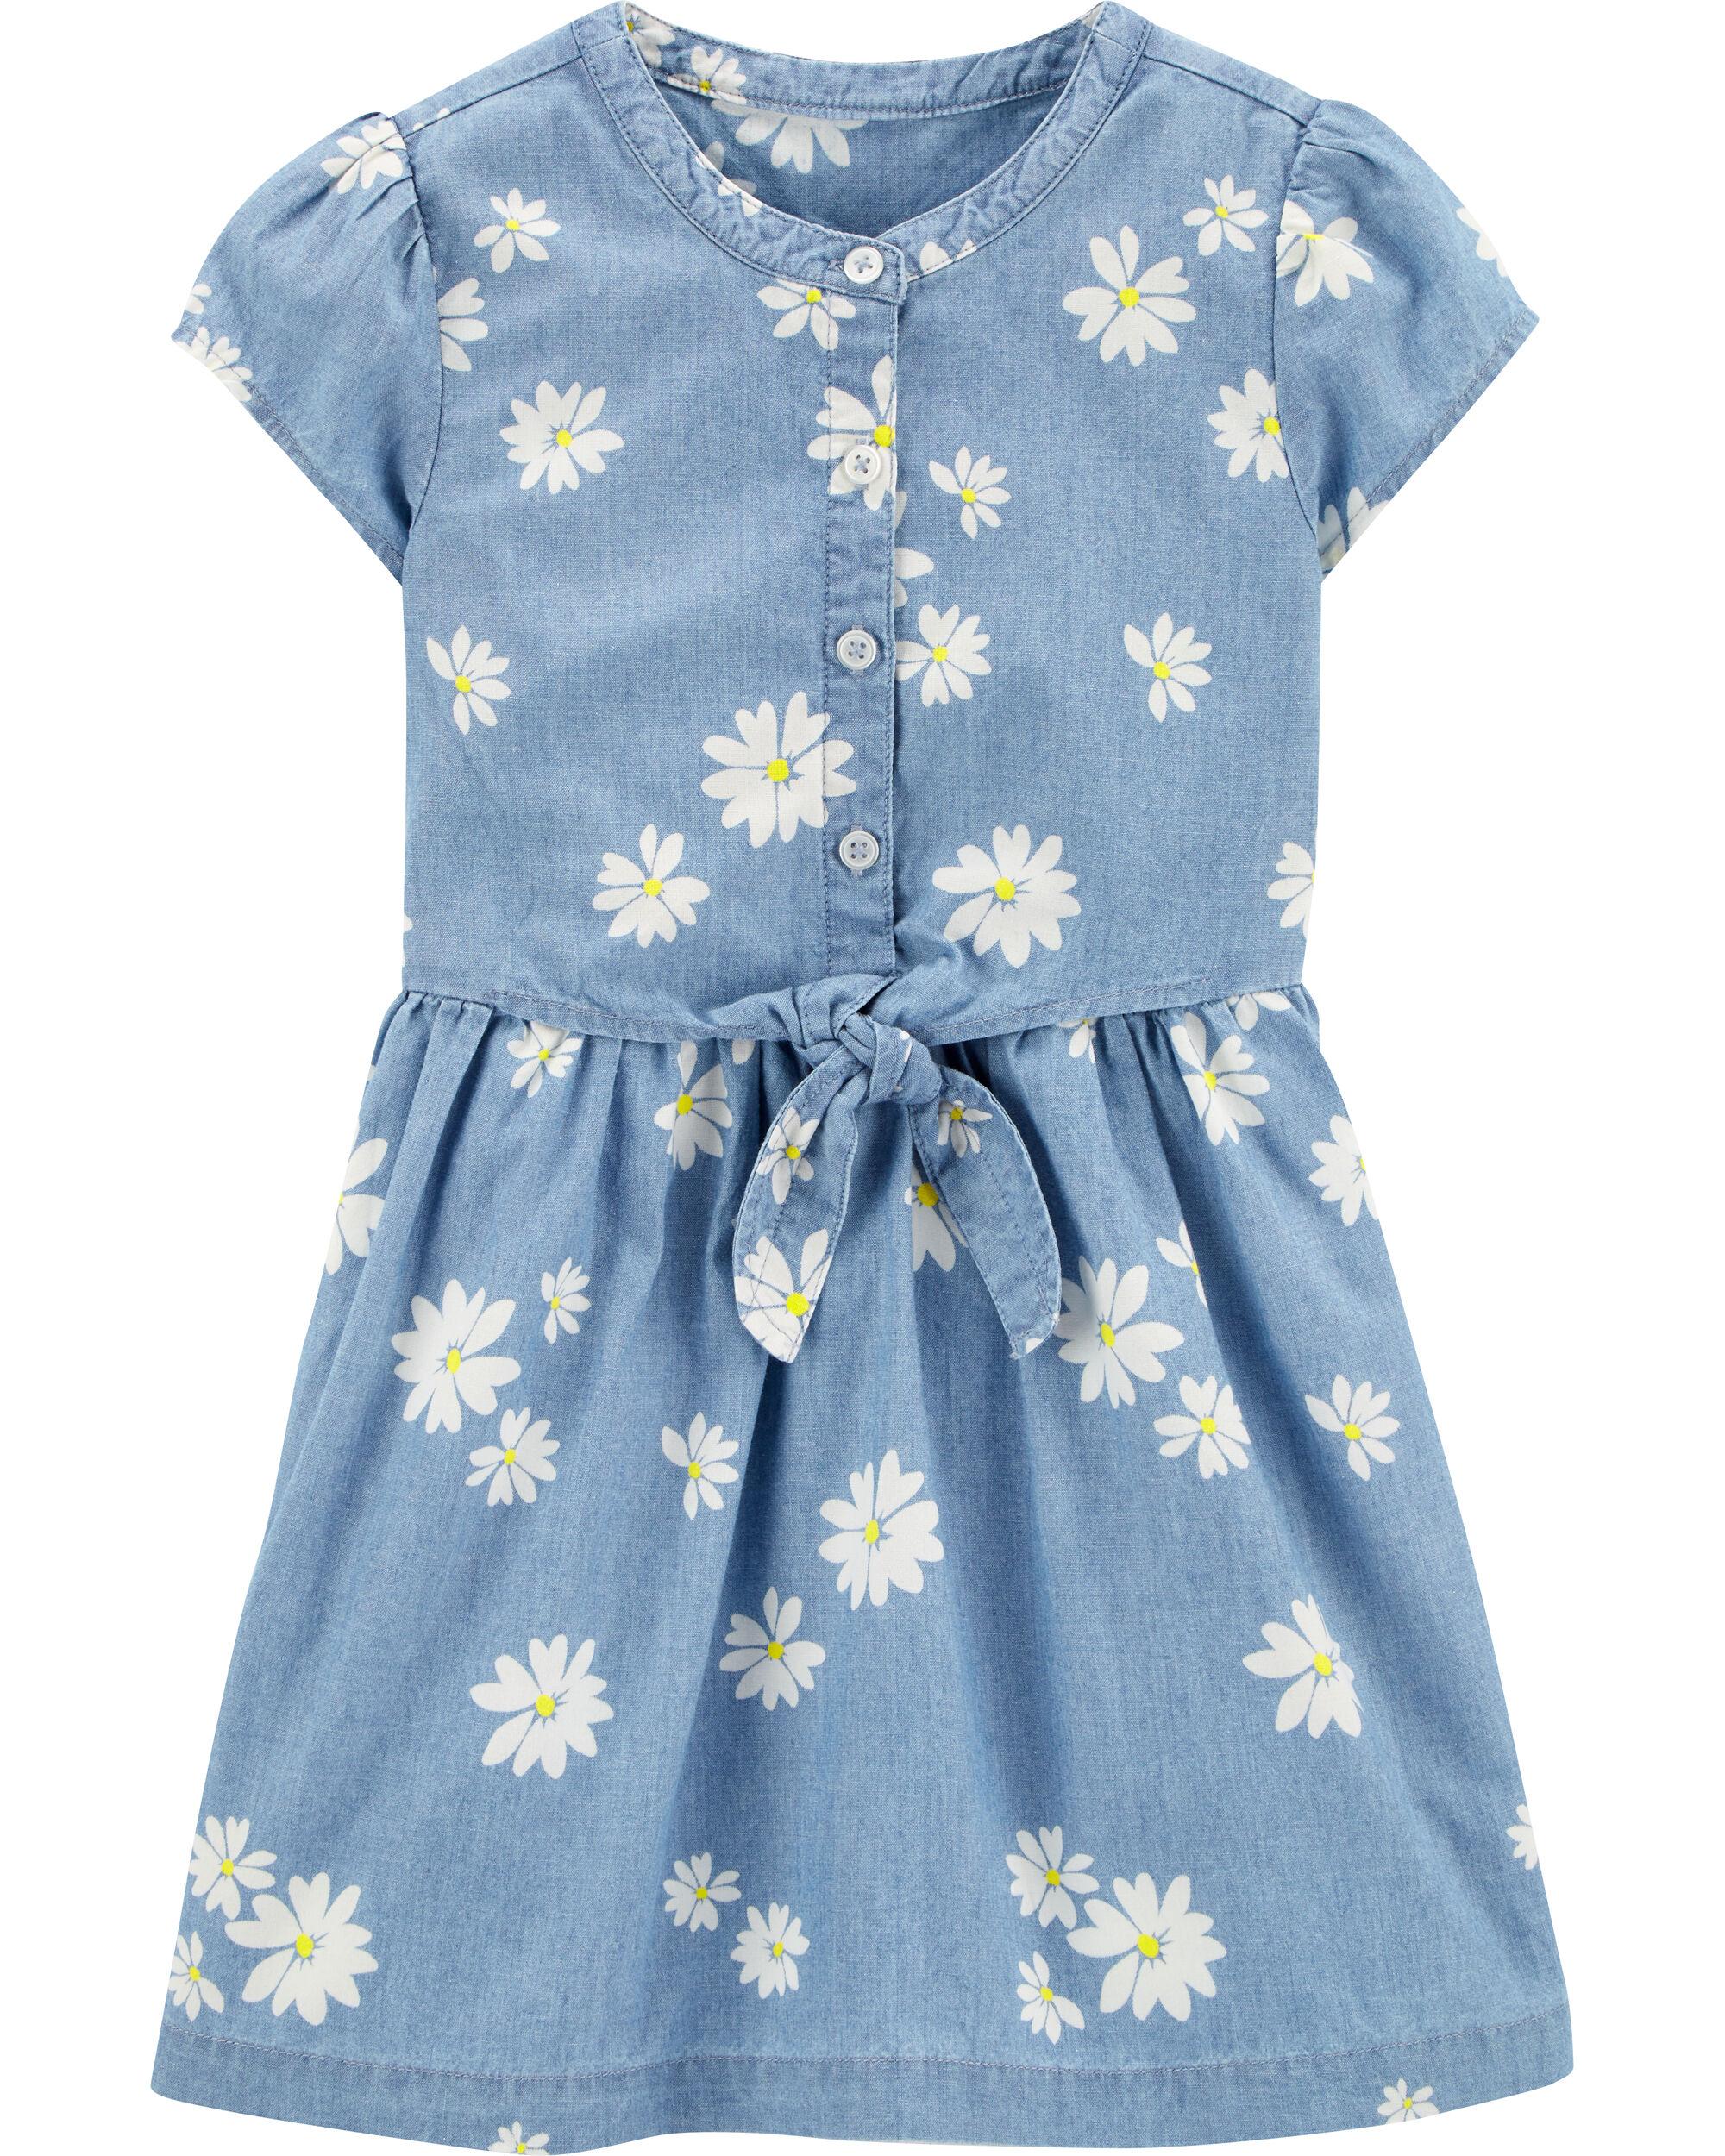 NWT Toddler Girls Carter/'s Floral Print Dress Multi Color Flowers Fancy